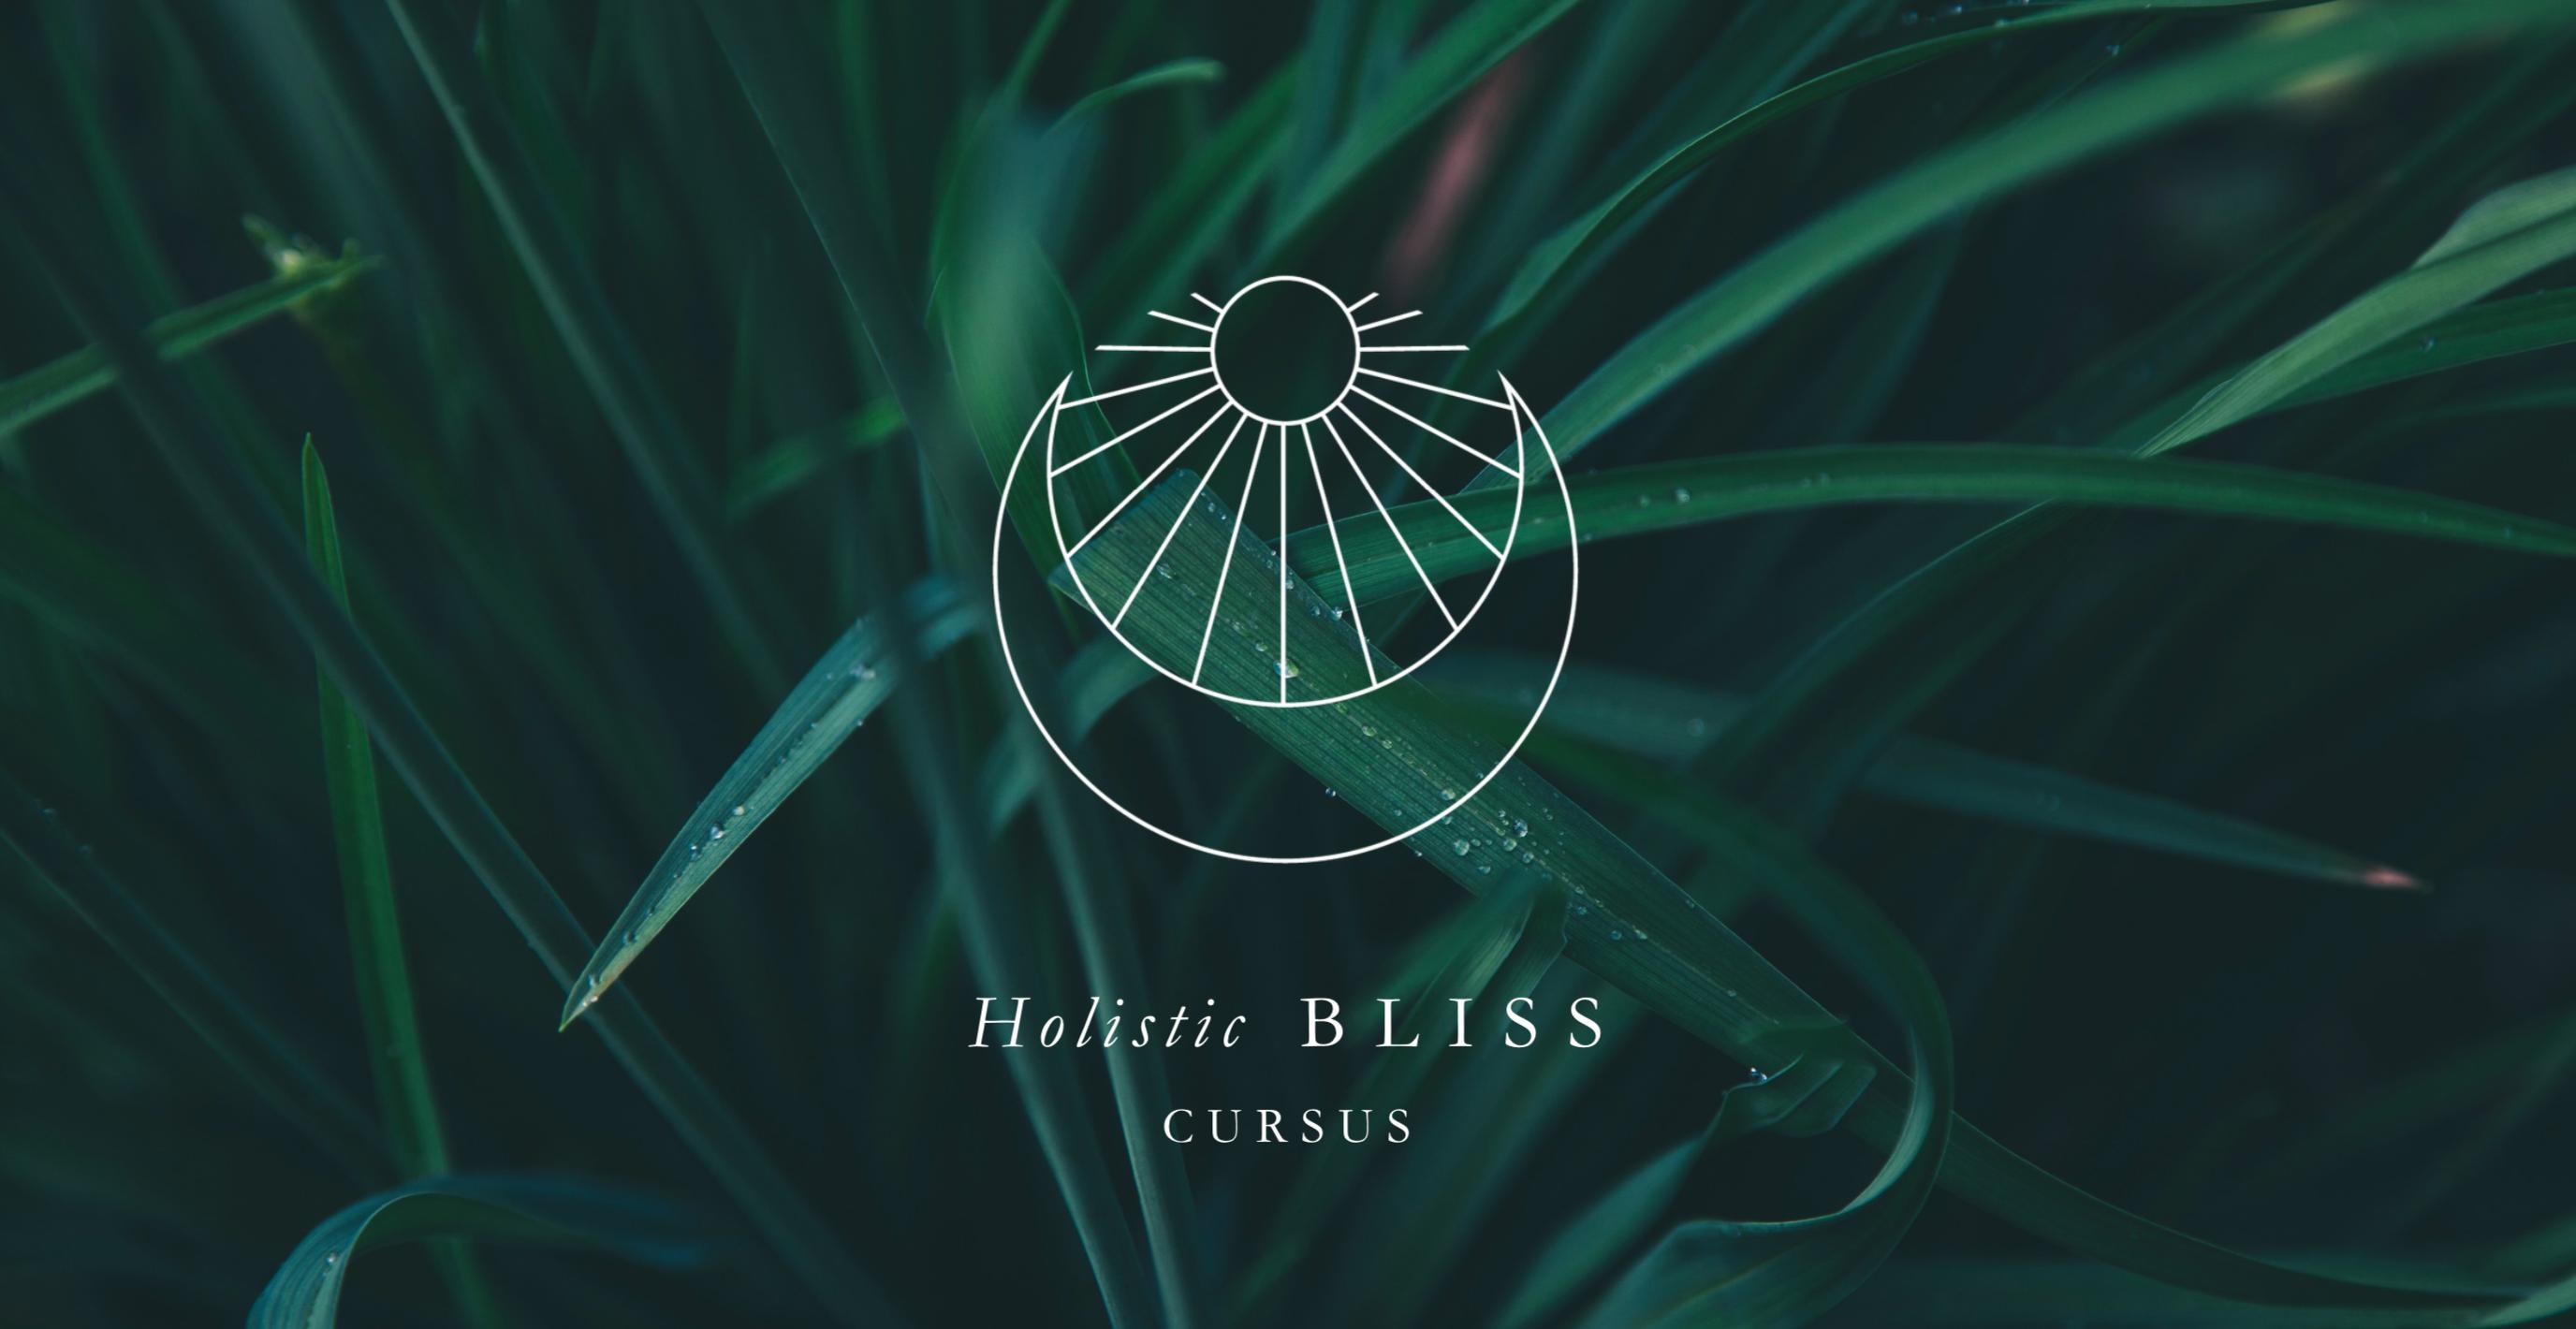 Achtergrond Holistic Bliss